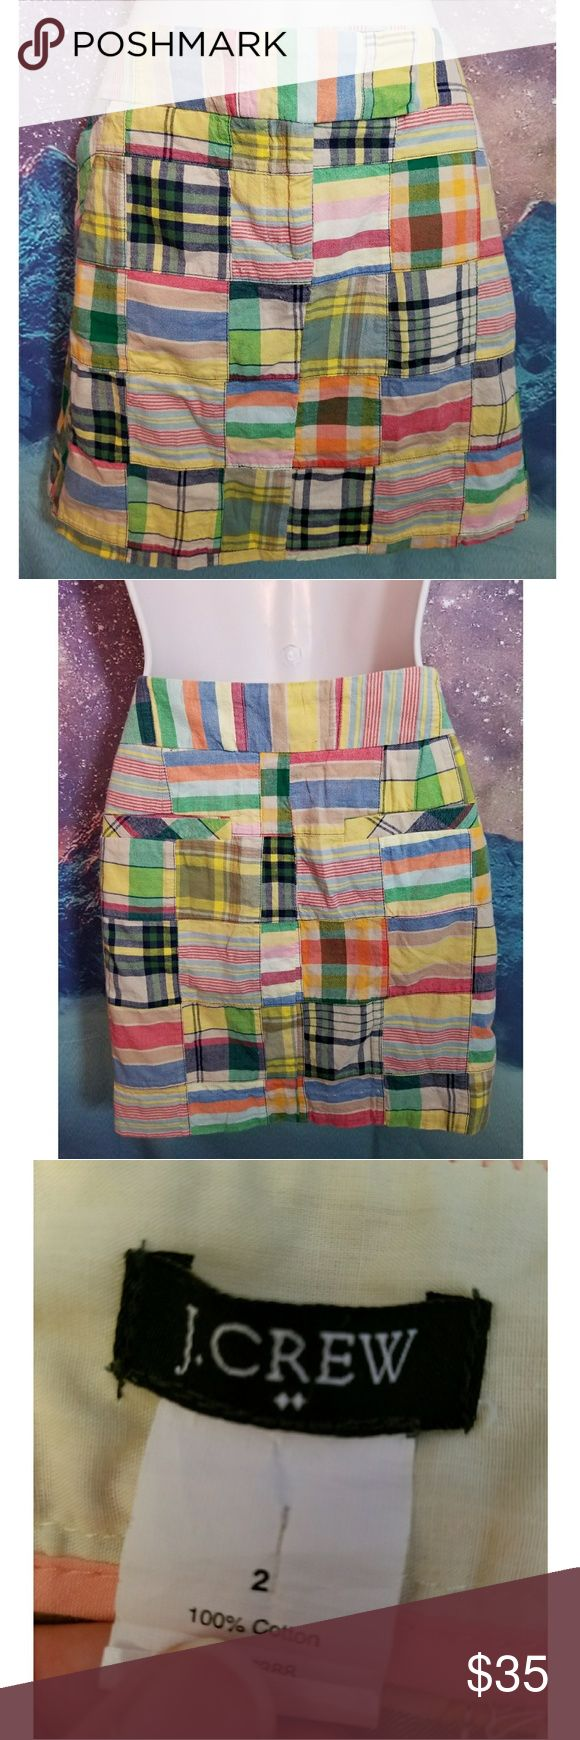 J. Crew Patchwork Plaid Mini Skirt J. Crew mini skirt excellent condition size 2 J. Crew Factory Skirts Mini